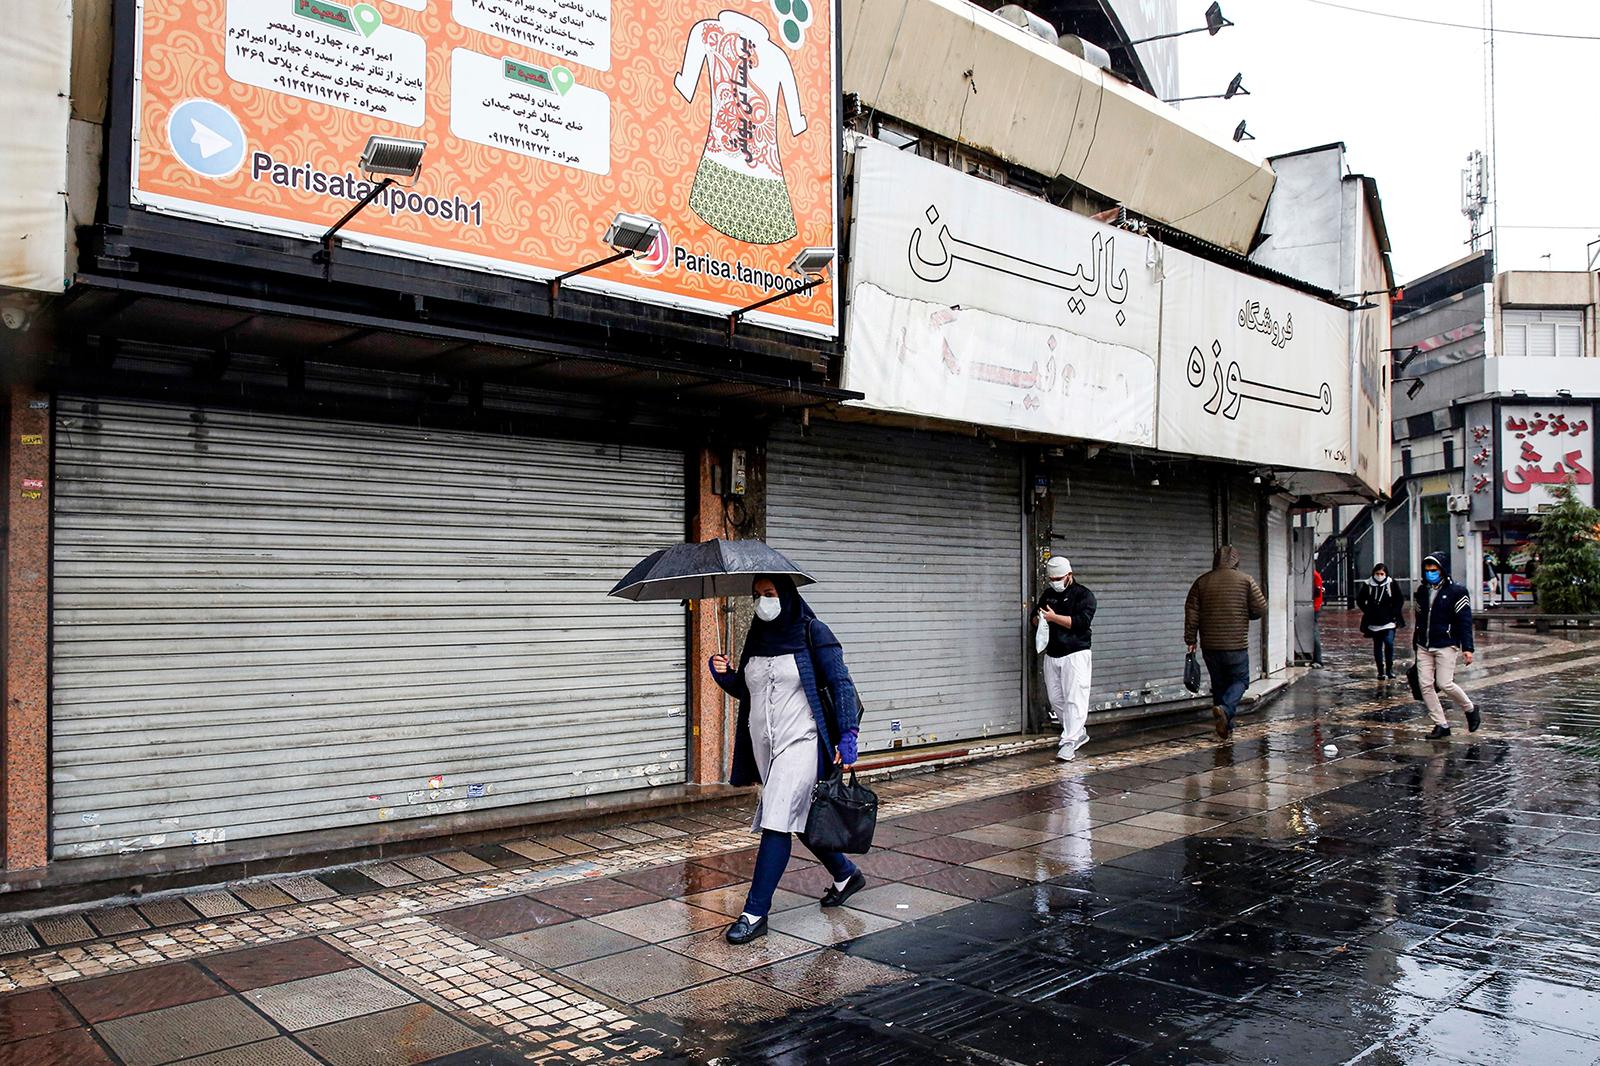 Pedestrians walk past closed shops along a street in Iran's capital Tehran on Nov. 21.